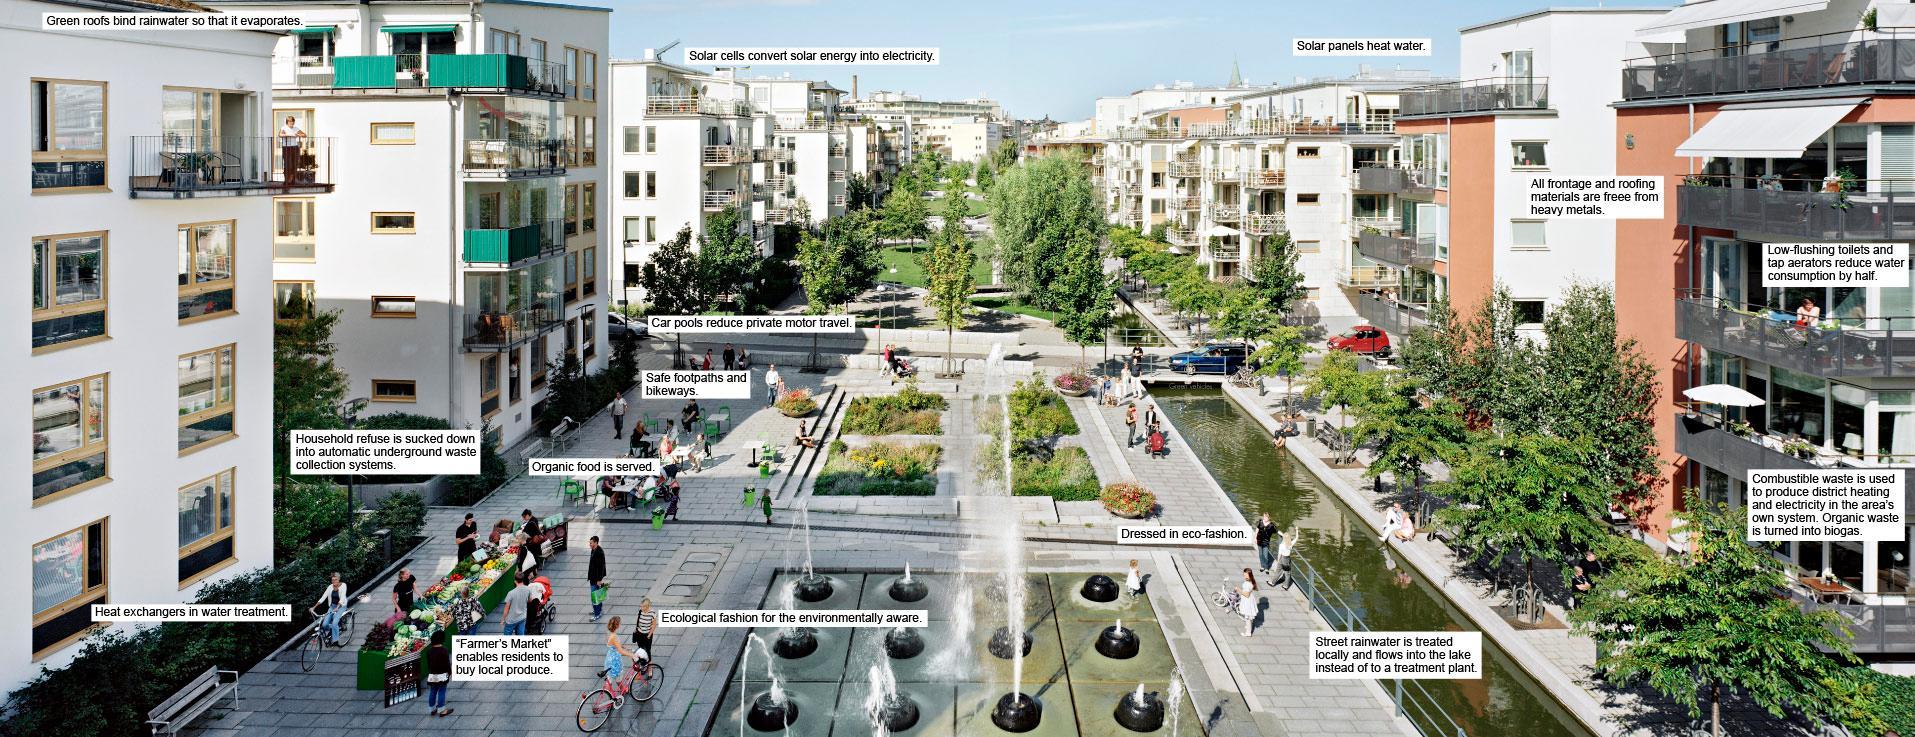 Ville et environnement leblogdelaville for Environnement piscine